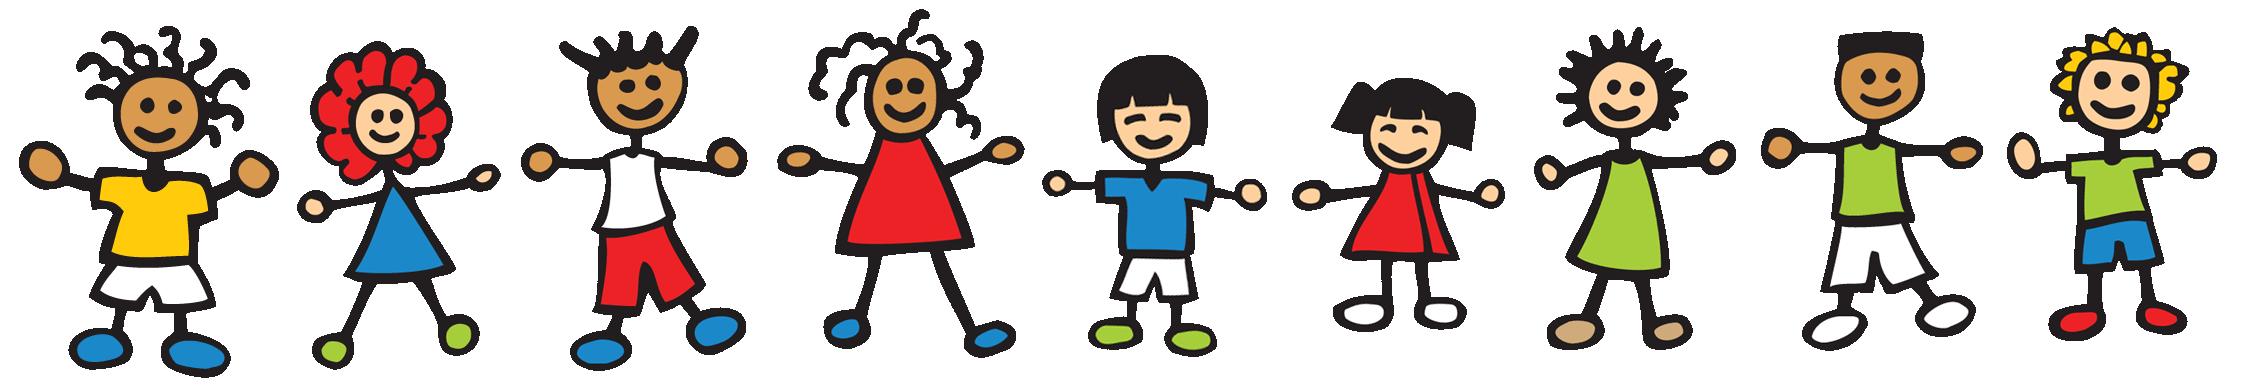 Pediatrician caring for mandeville covin-Pediatrician caring for mandeville covington area clip art-18